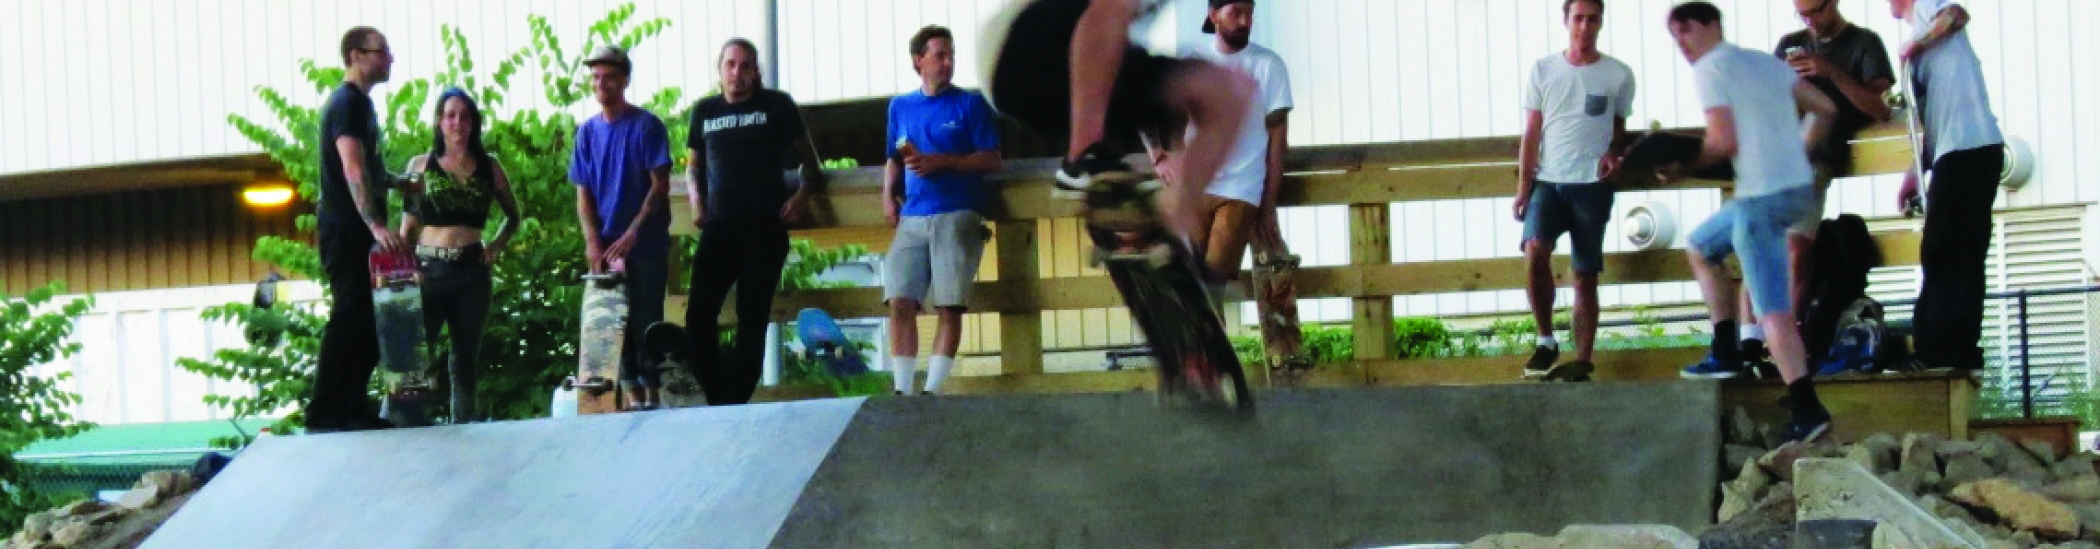 skateboarding at Grays Ferry Crescent